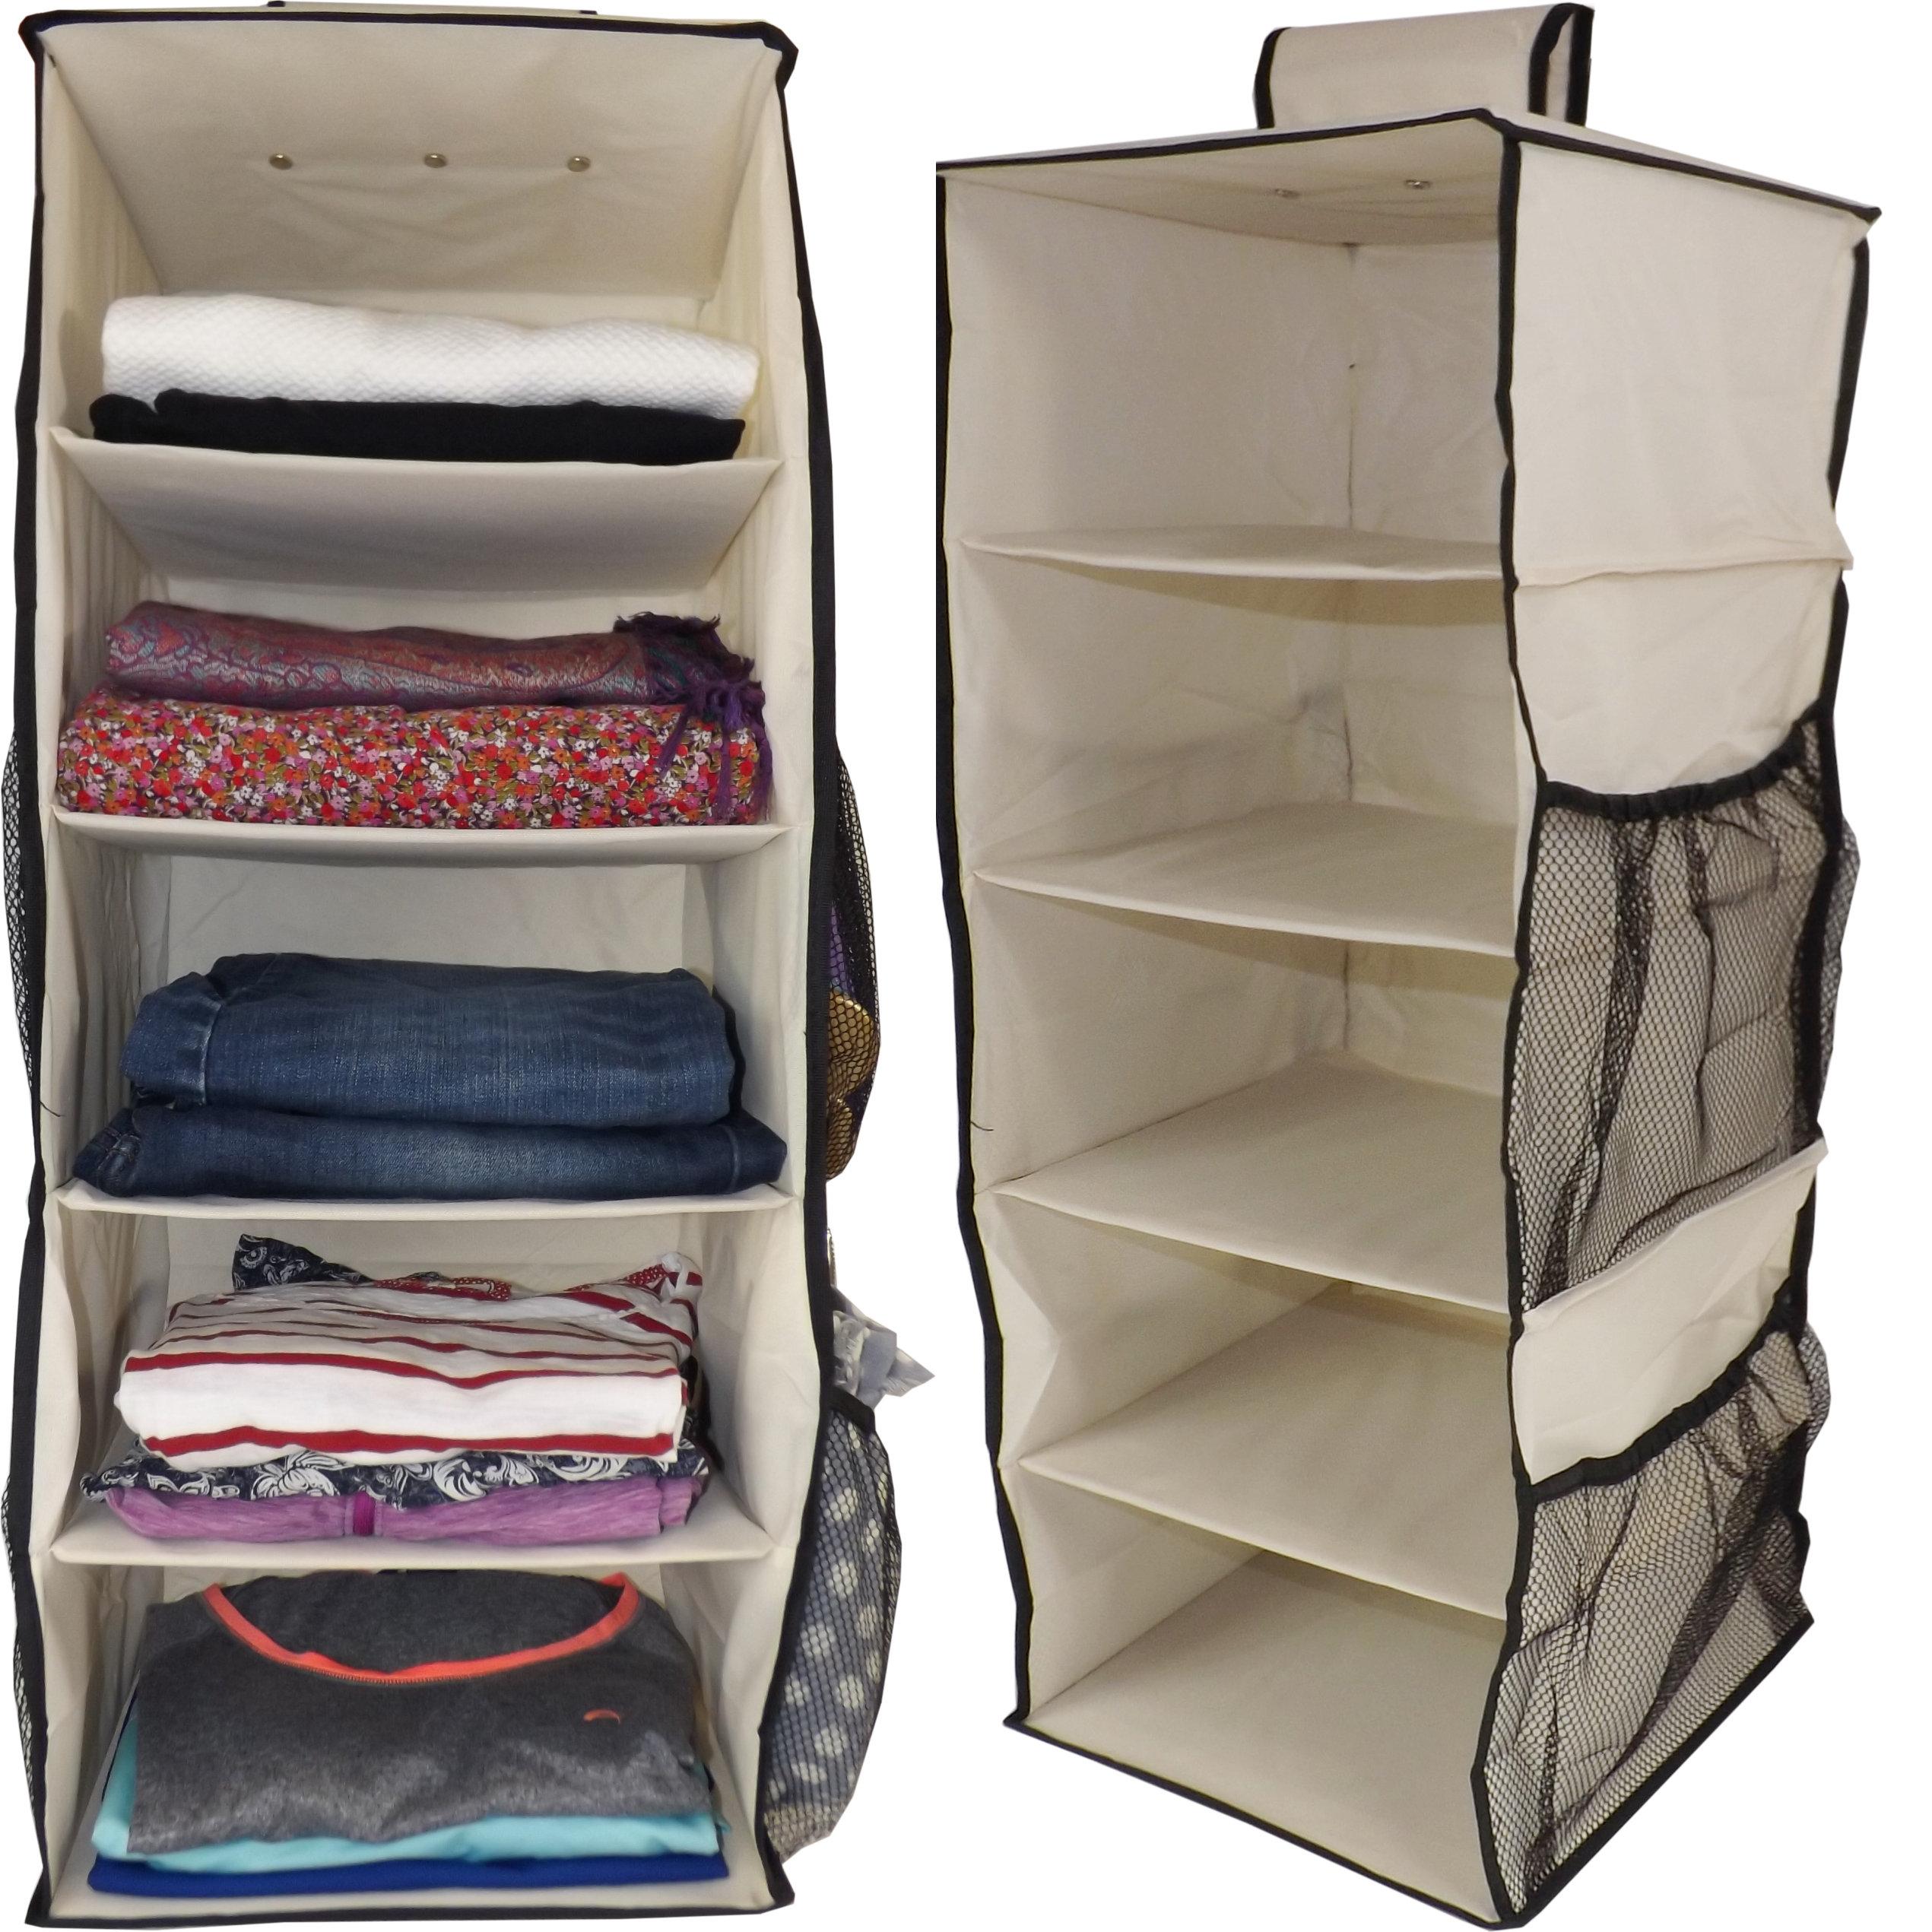 Hanging Wardrobe Organiser, Heavy Duty, 5 Shelves, 76x30x30cm, Beige